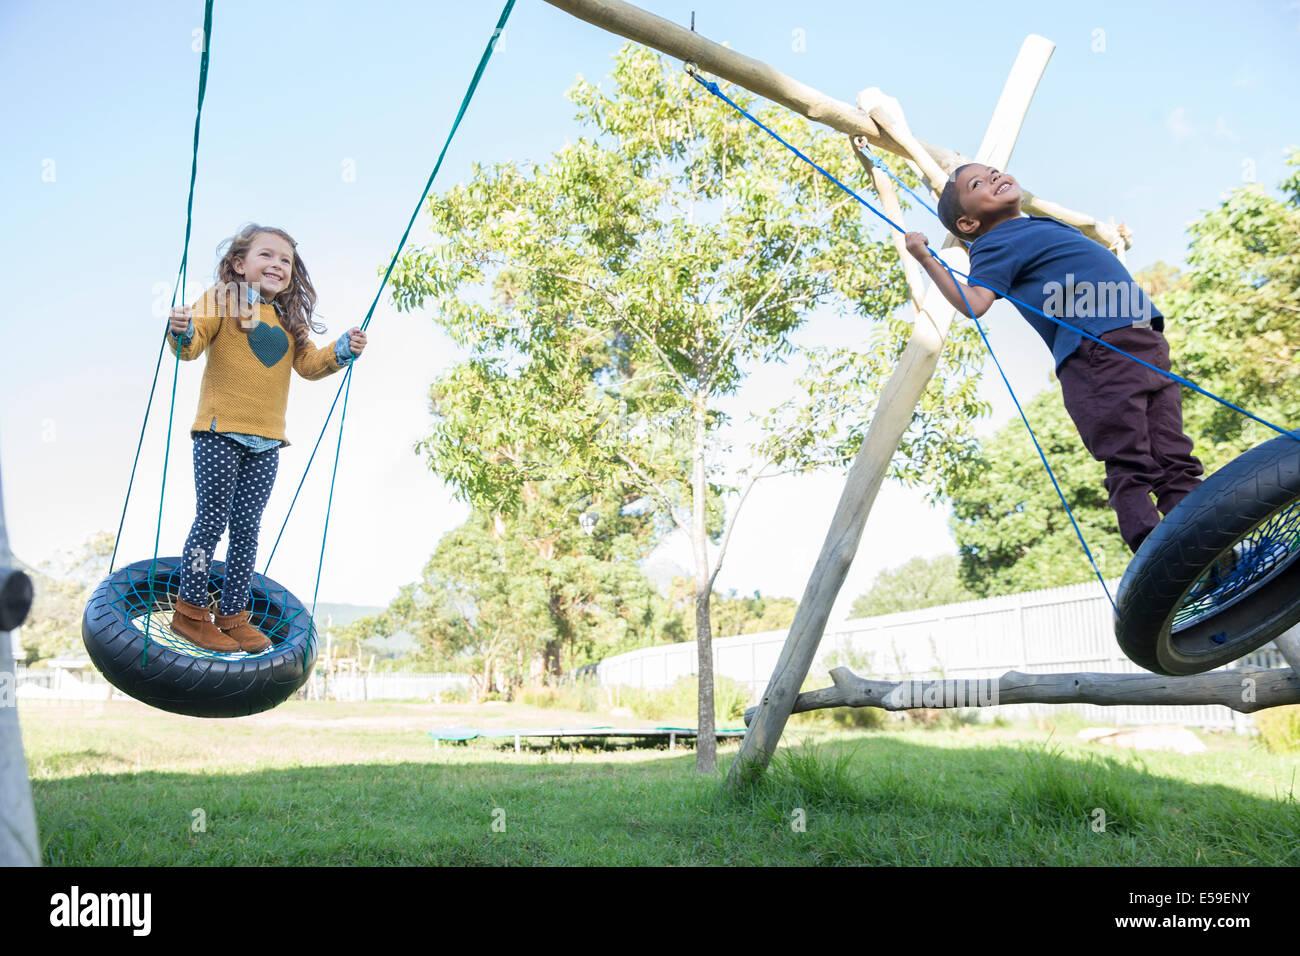 Kinder spielen am Reifenschaukeln Stockbild